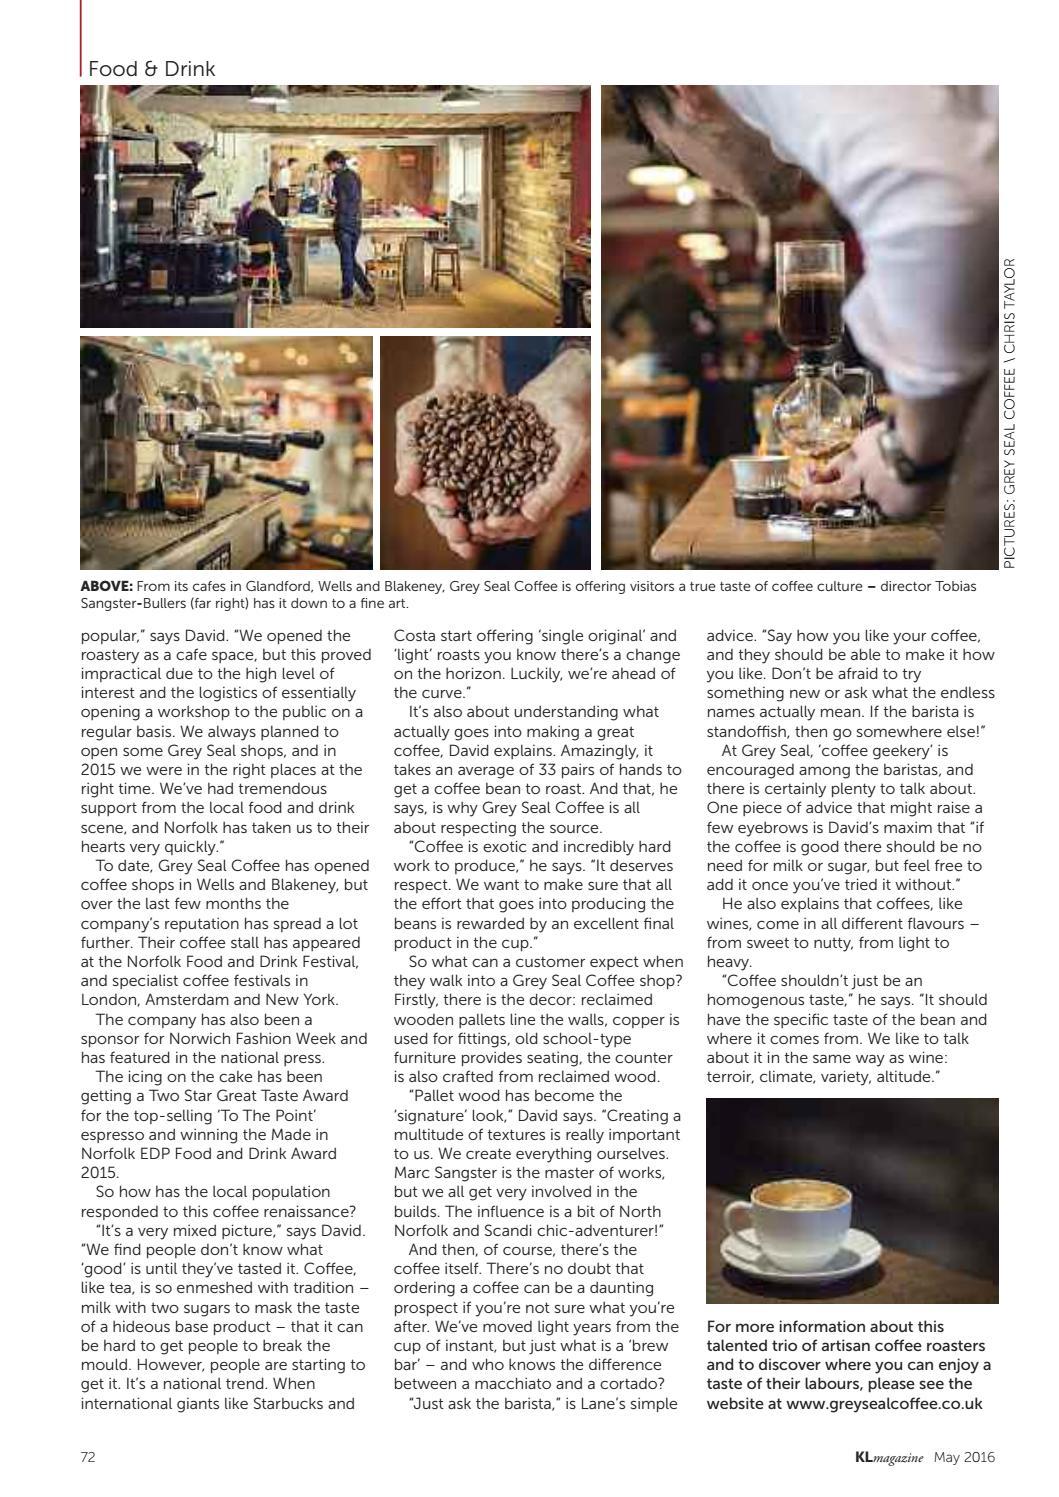 Kl Magazine May 2016 By Kl Magazine Issuu